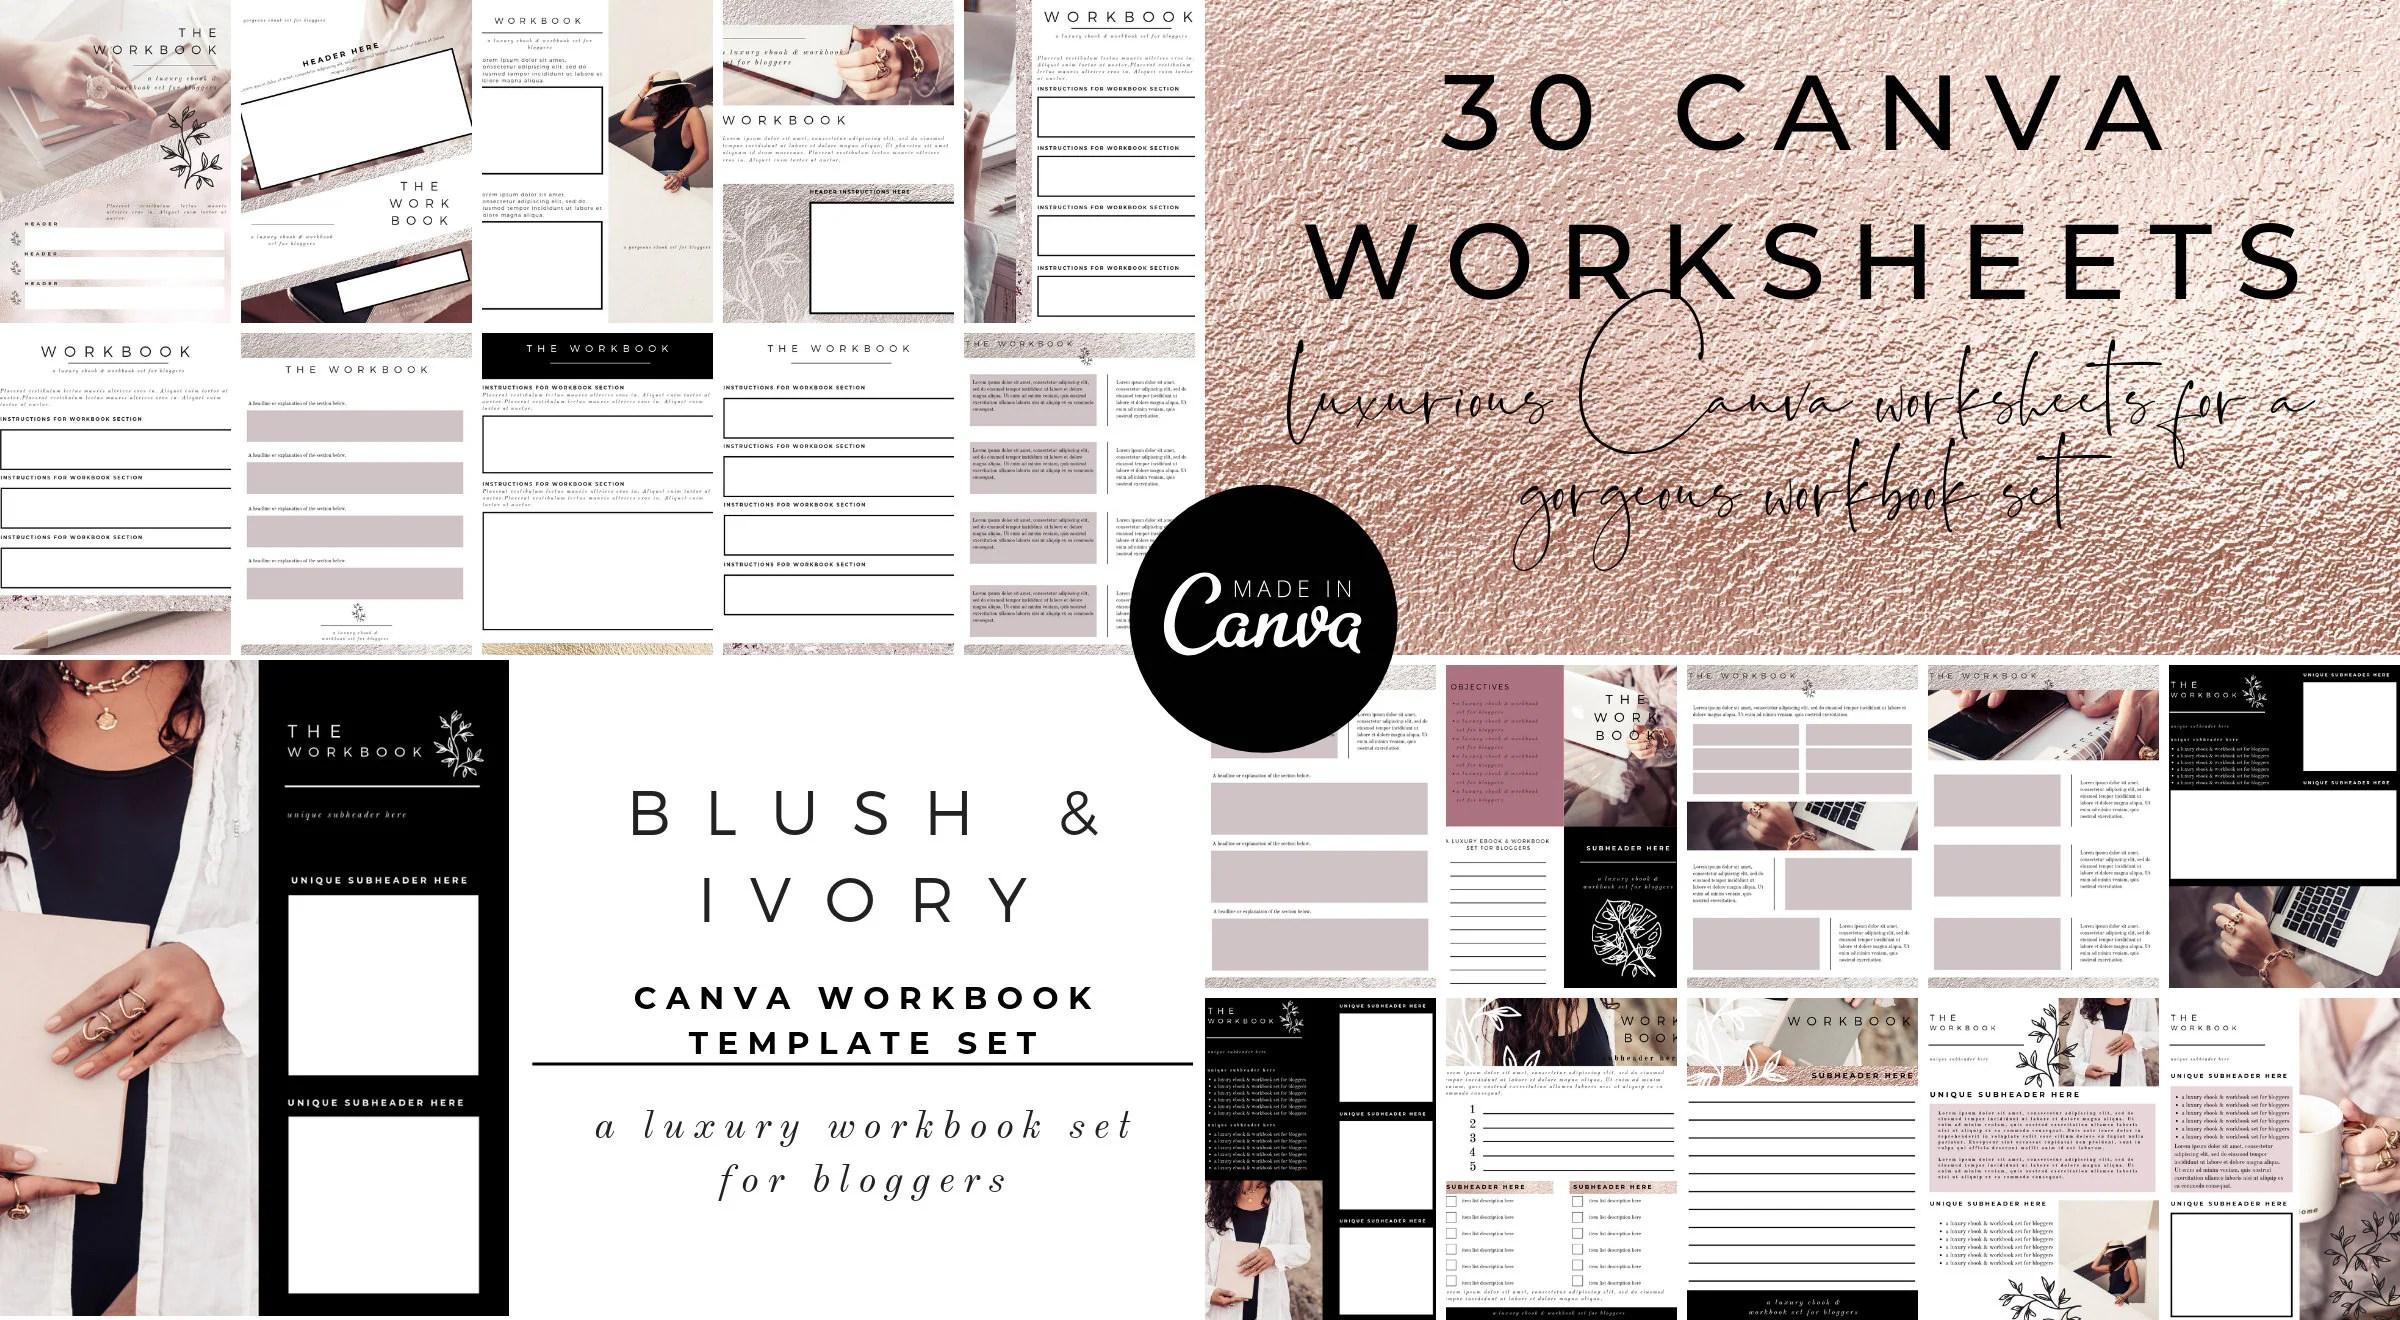 30 Canva Workbook Templates